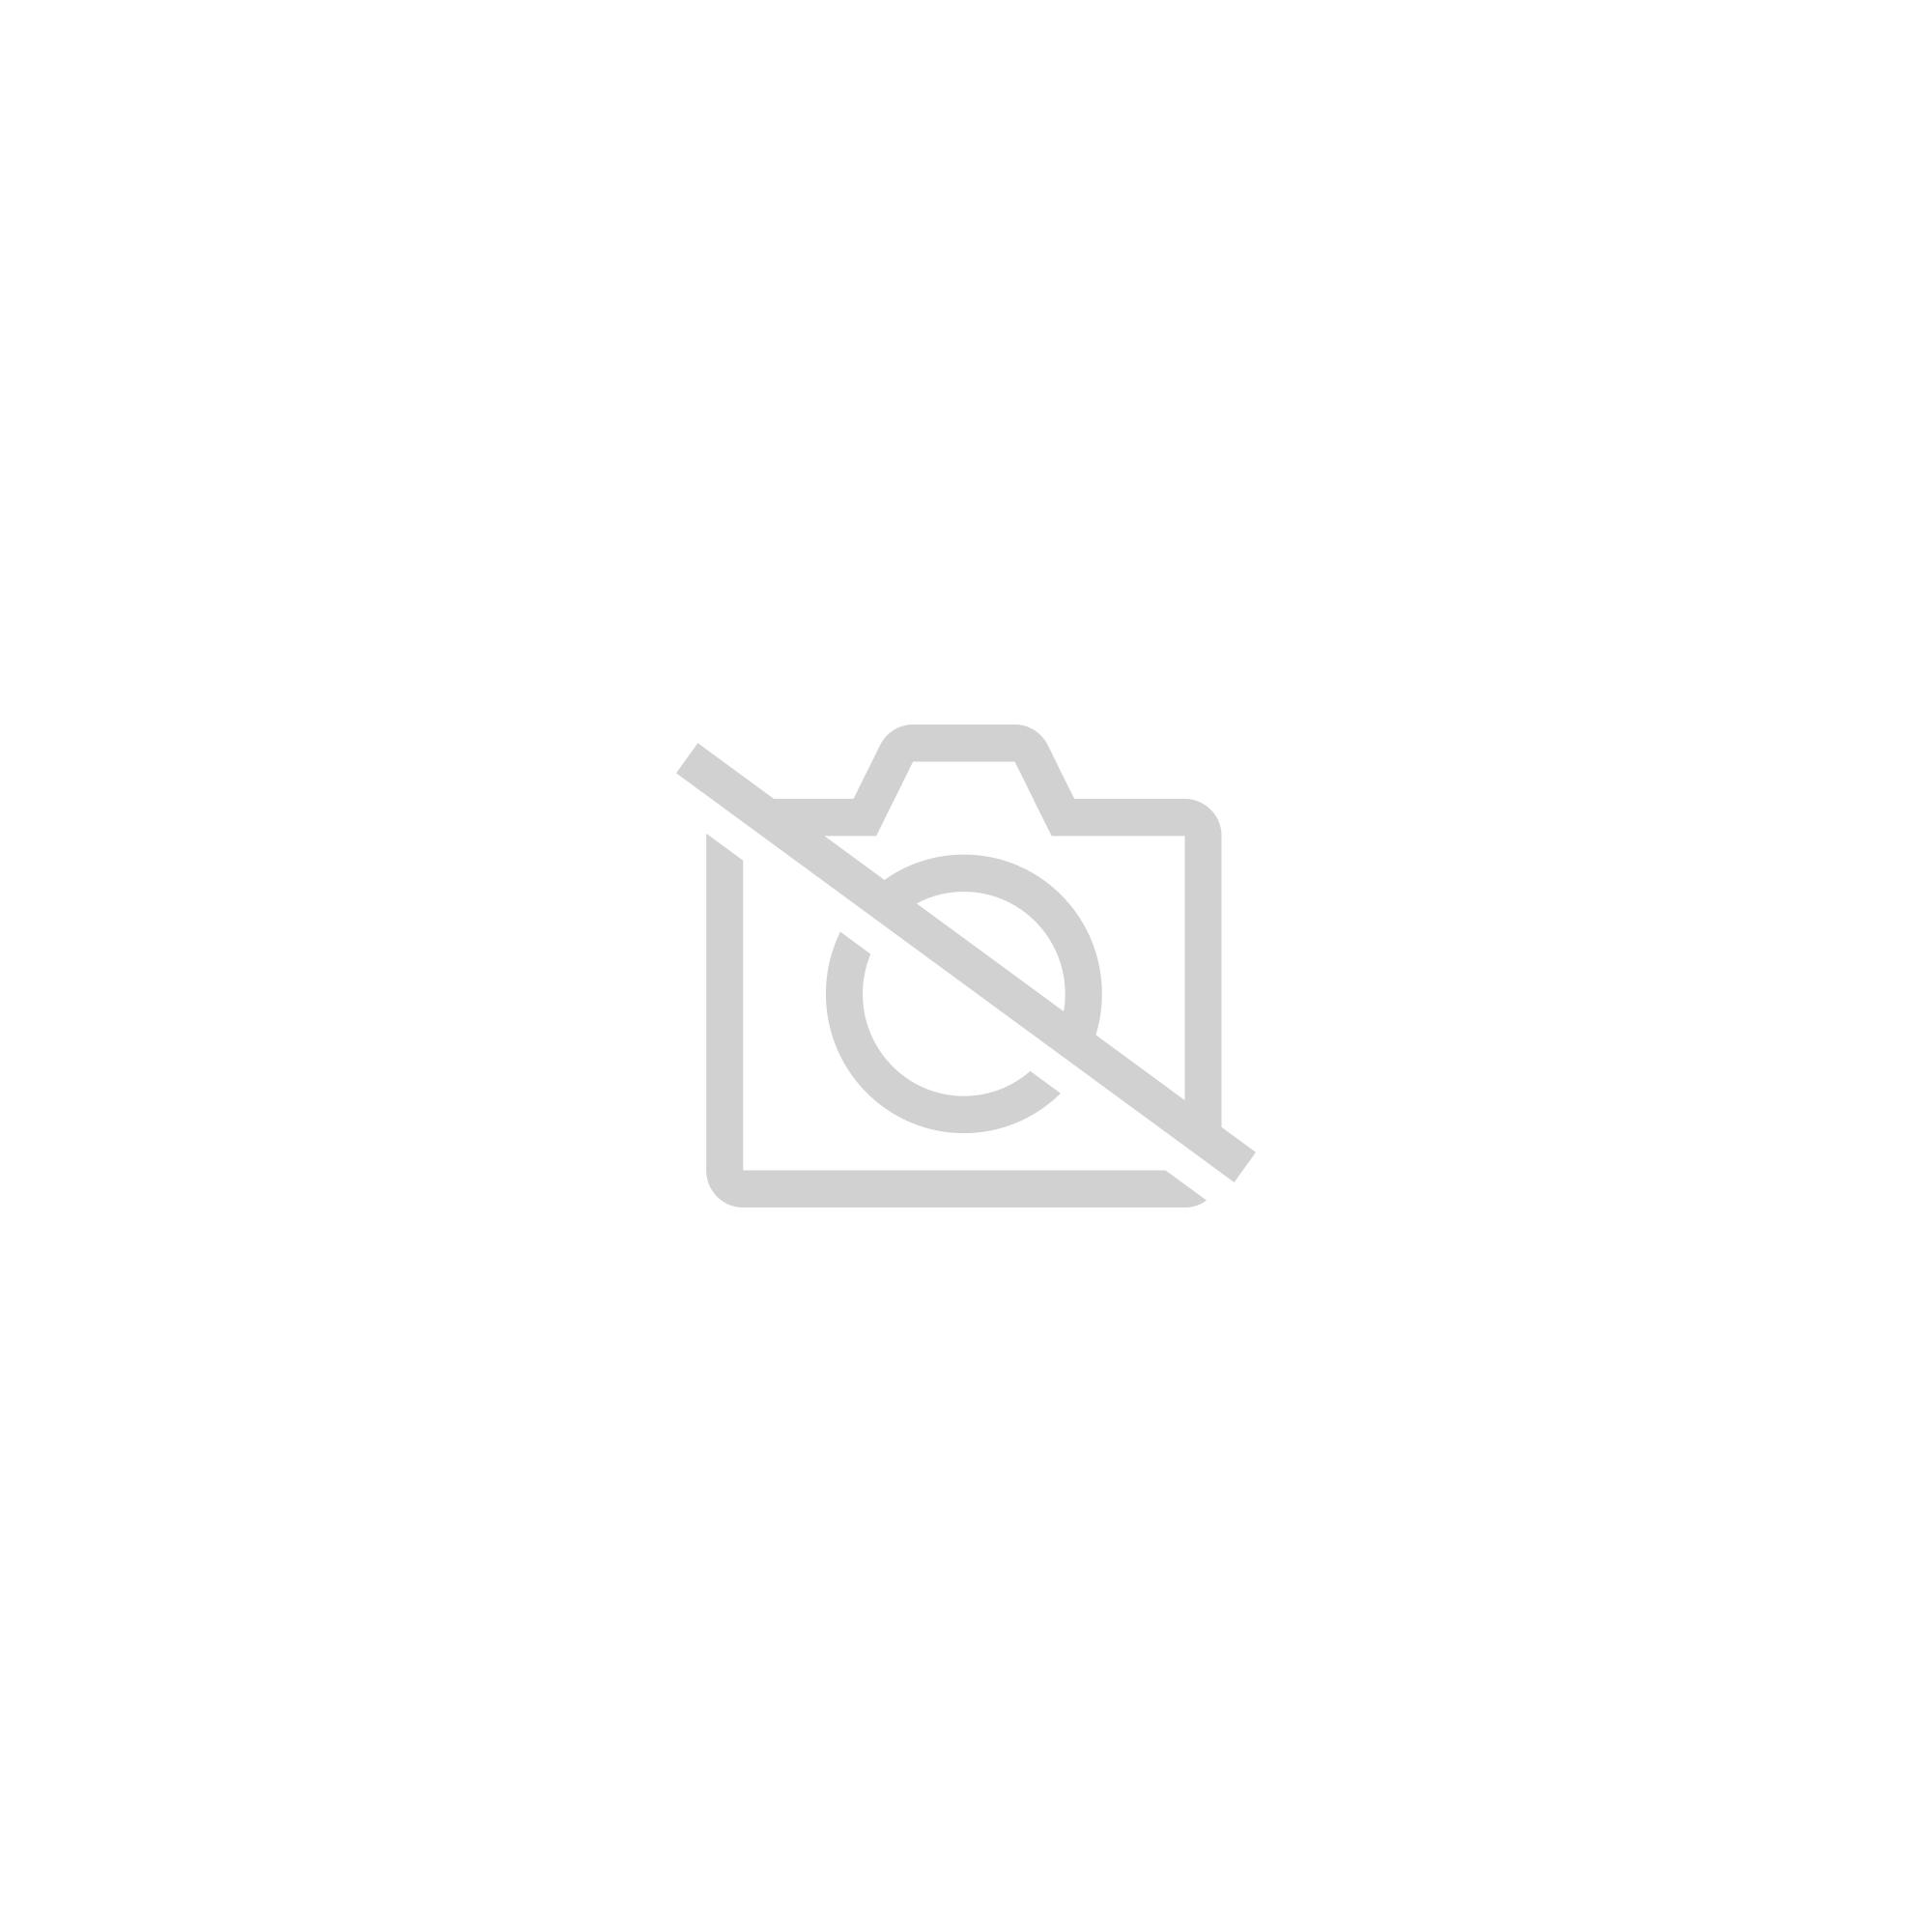 coffret lot 5 emporte piece patisserie biscuit humour forme c ur. Black Bedroom Furniture Sets. Home Design Ideas